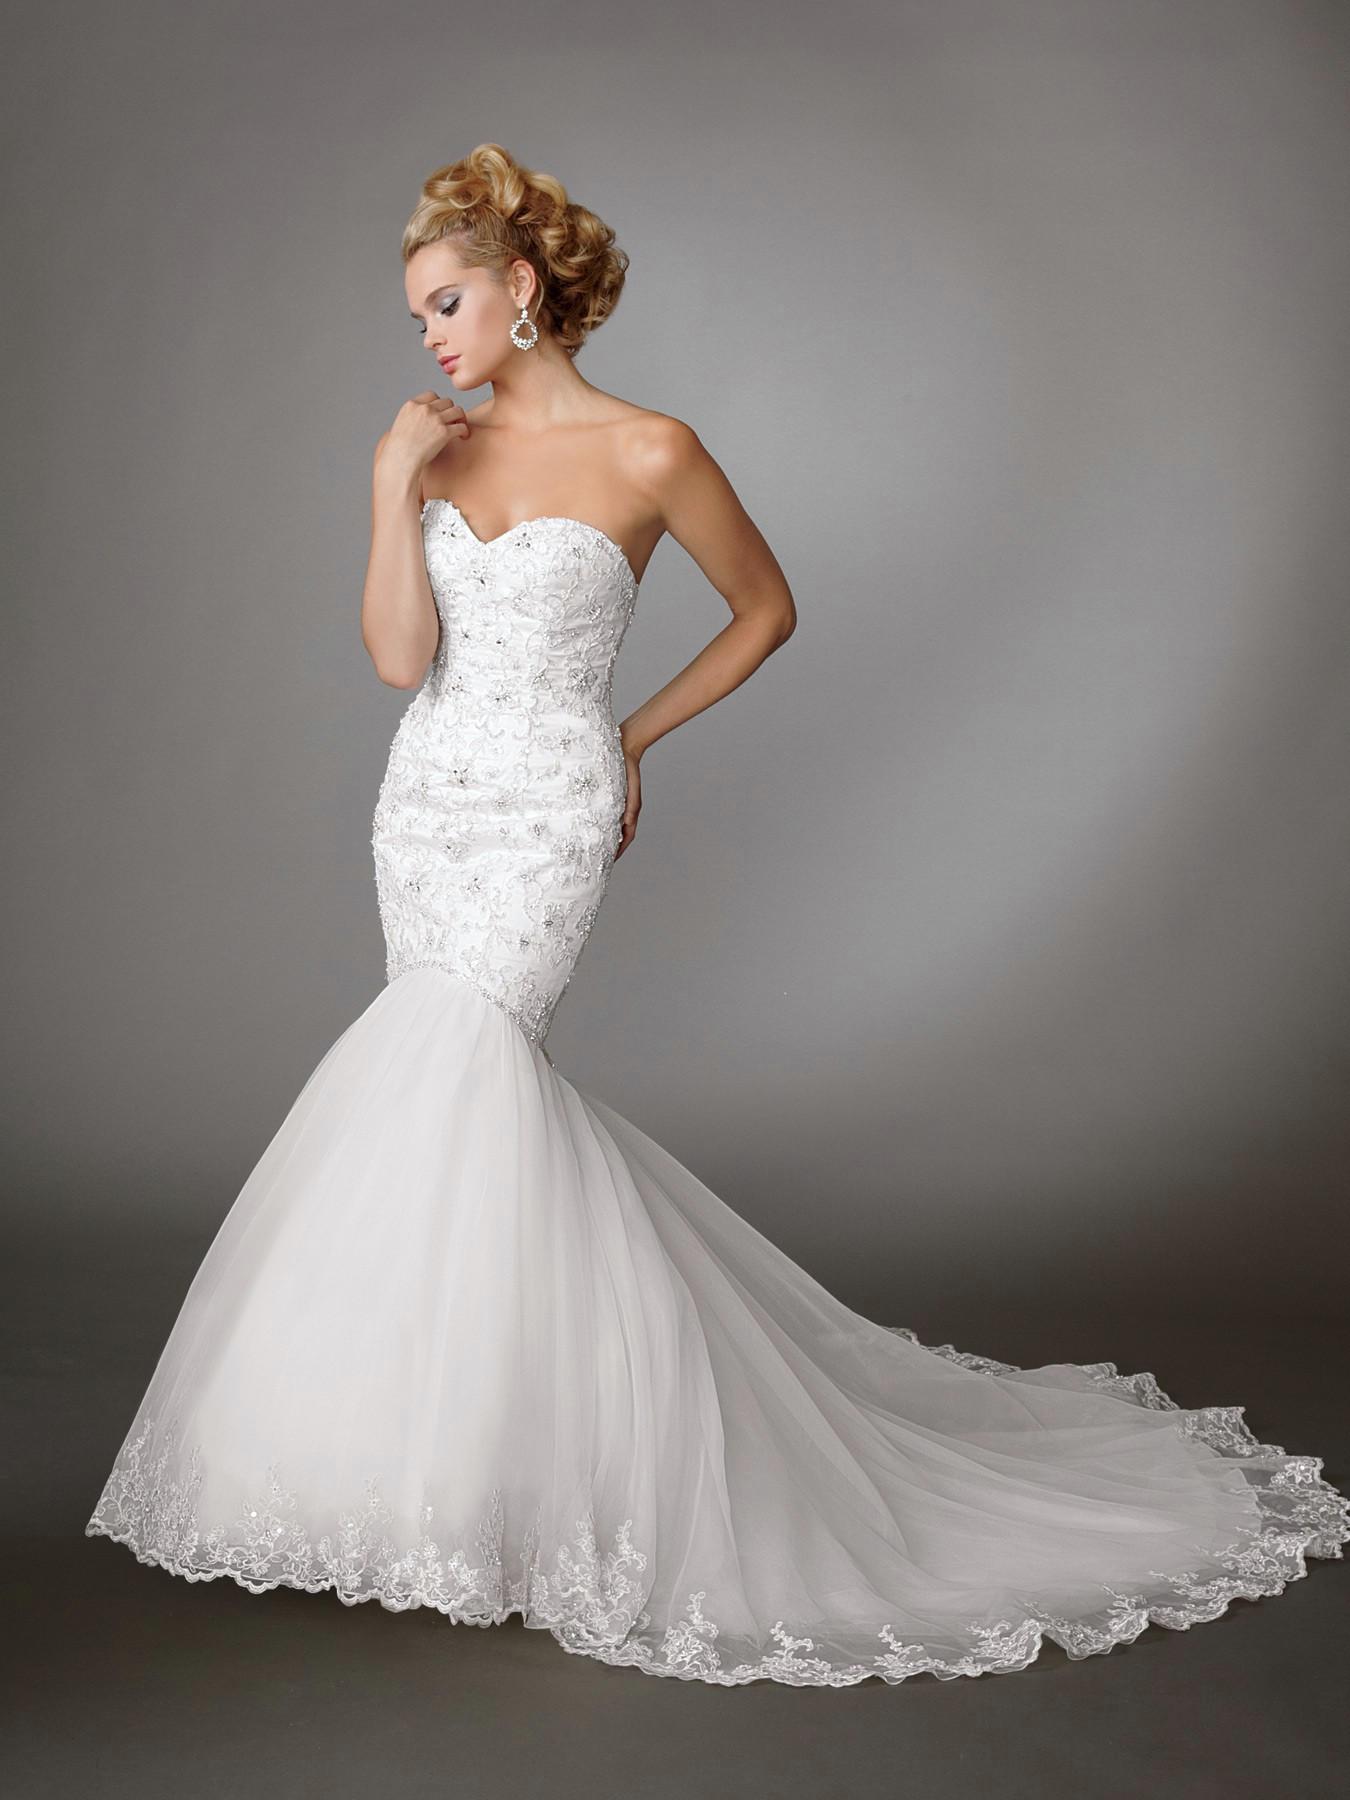 wedding mermaid dresses photo - 1